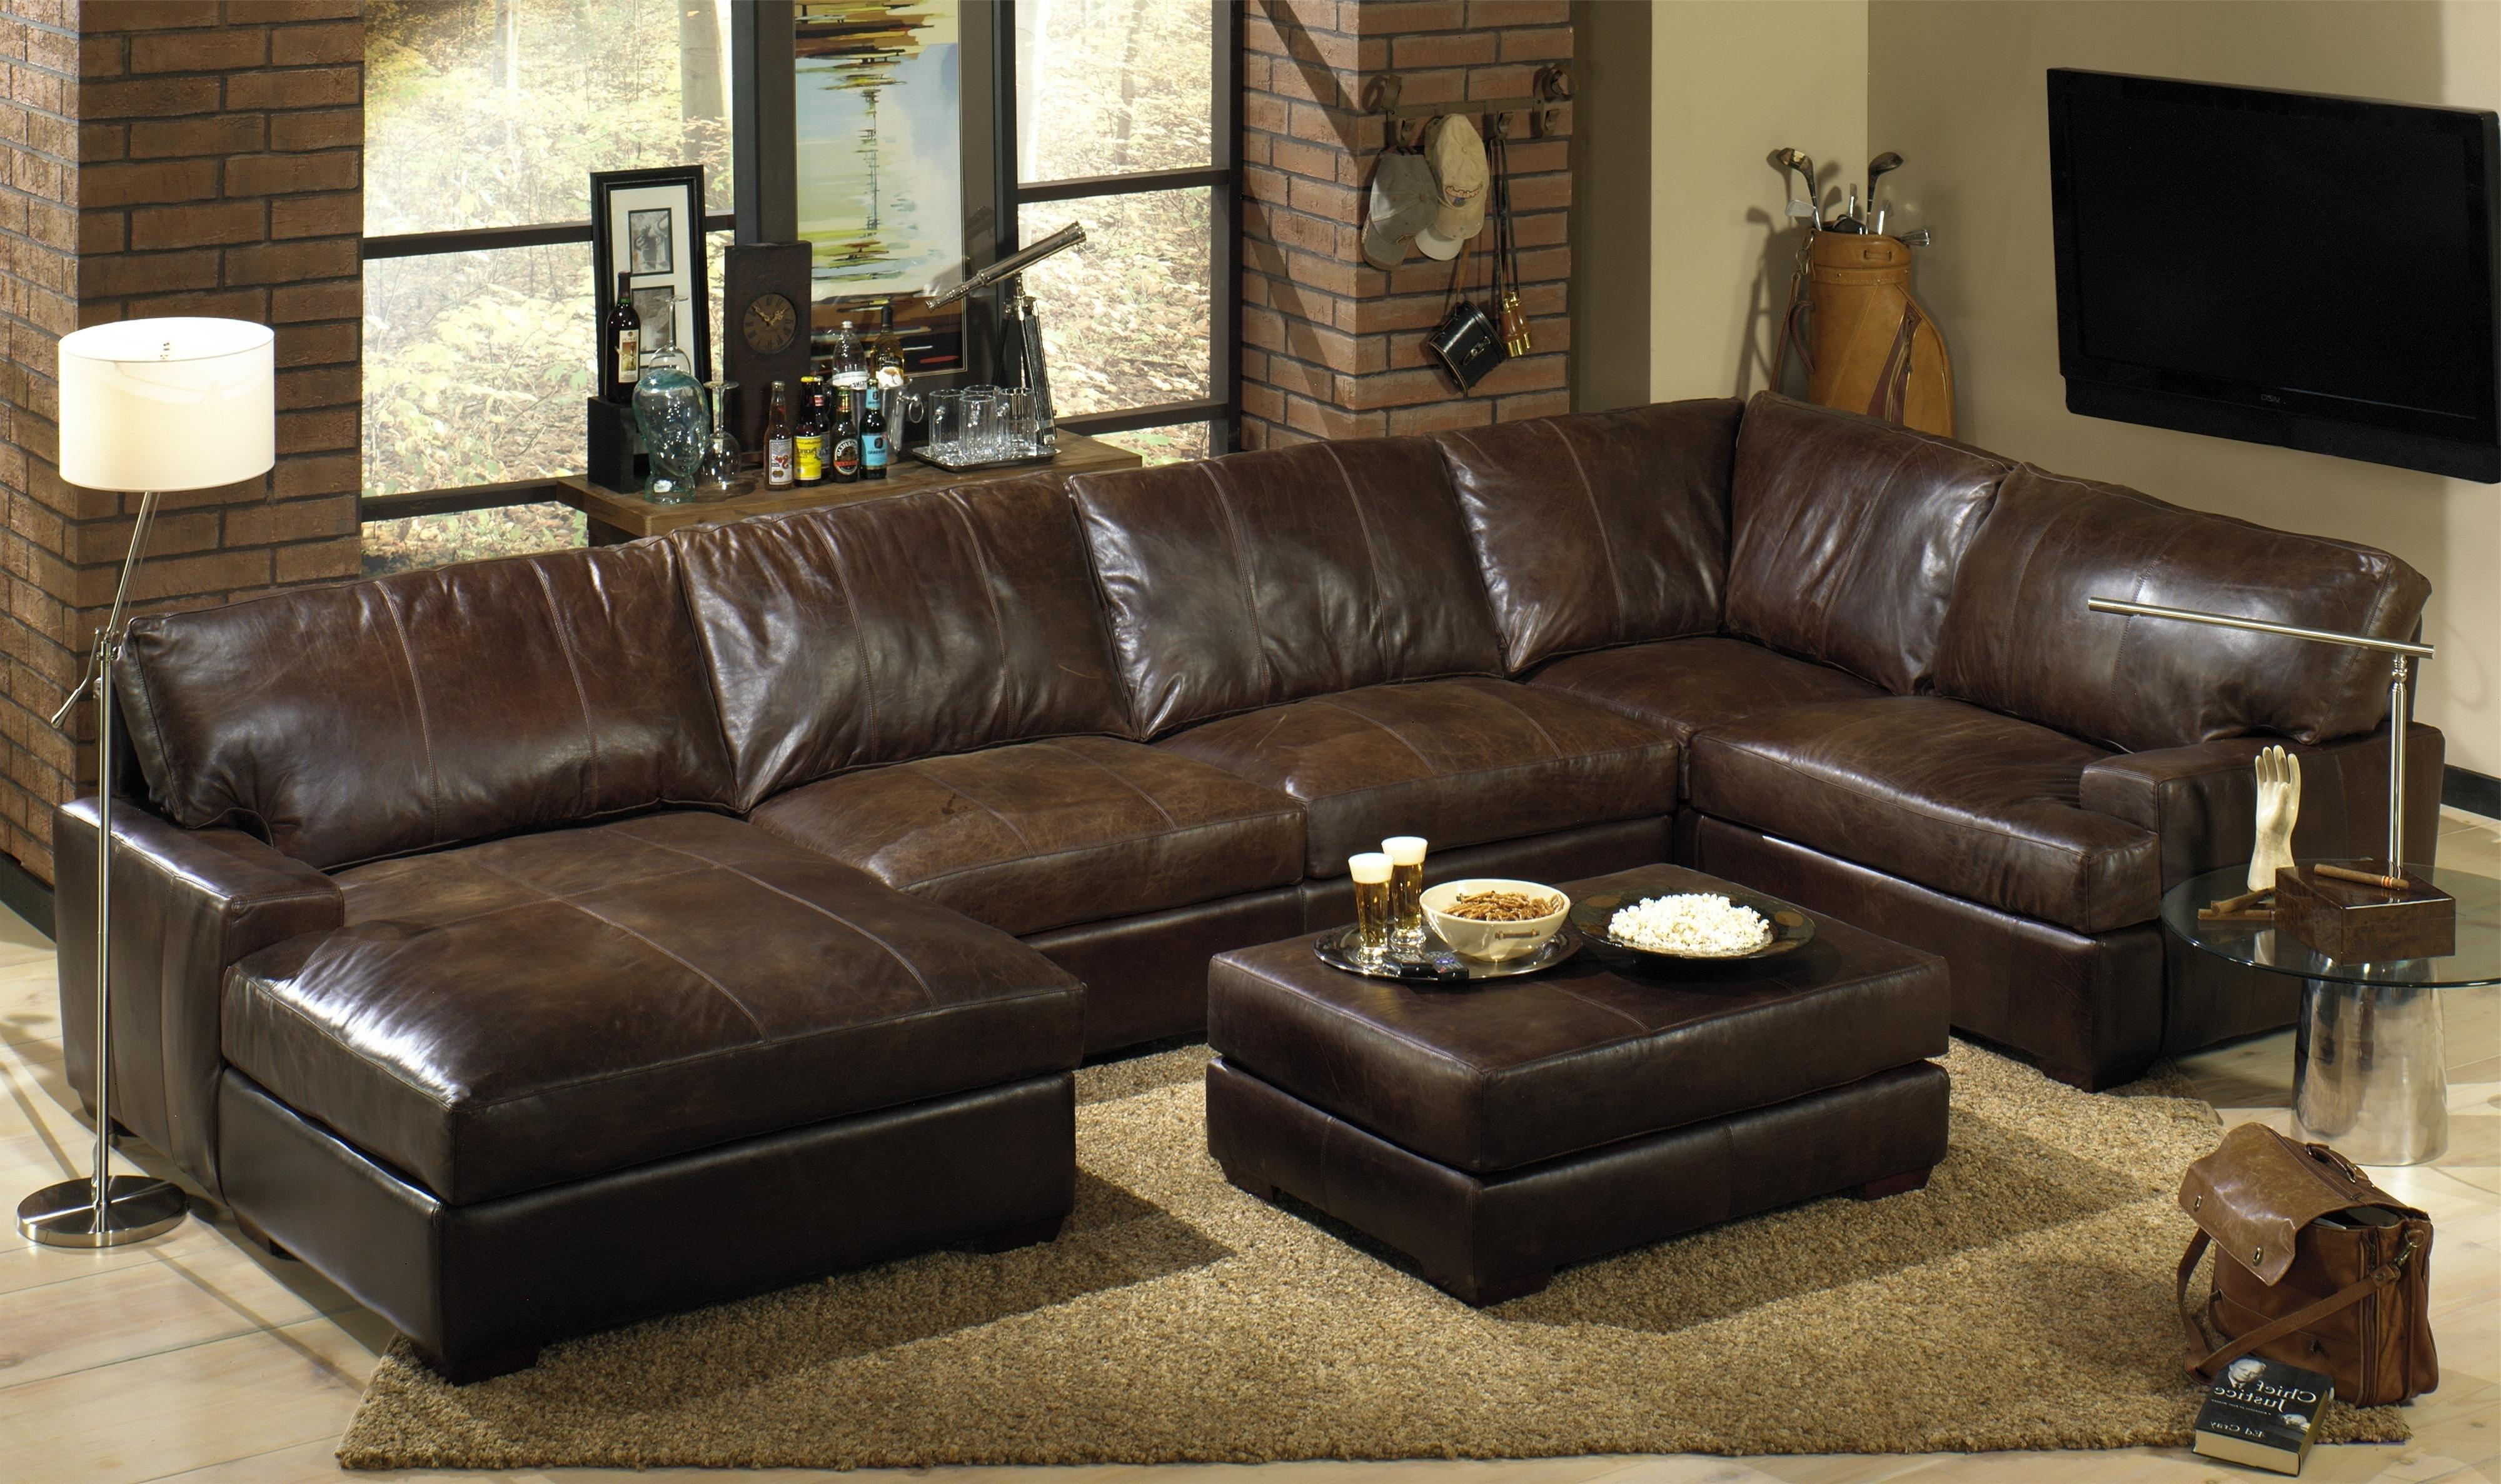 Fresh Sectional Sofas Big Lots (34 Photos) | Clubanfi Throughout Sectional Sofas At Big Lots (View 7 of 10)